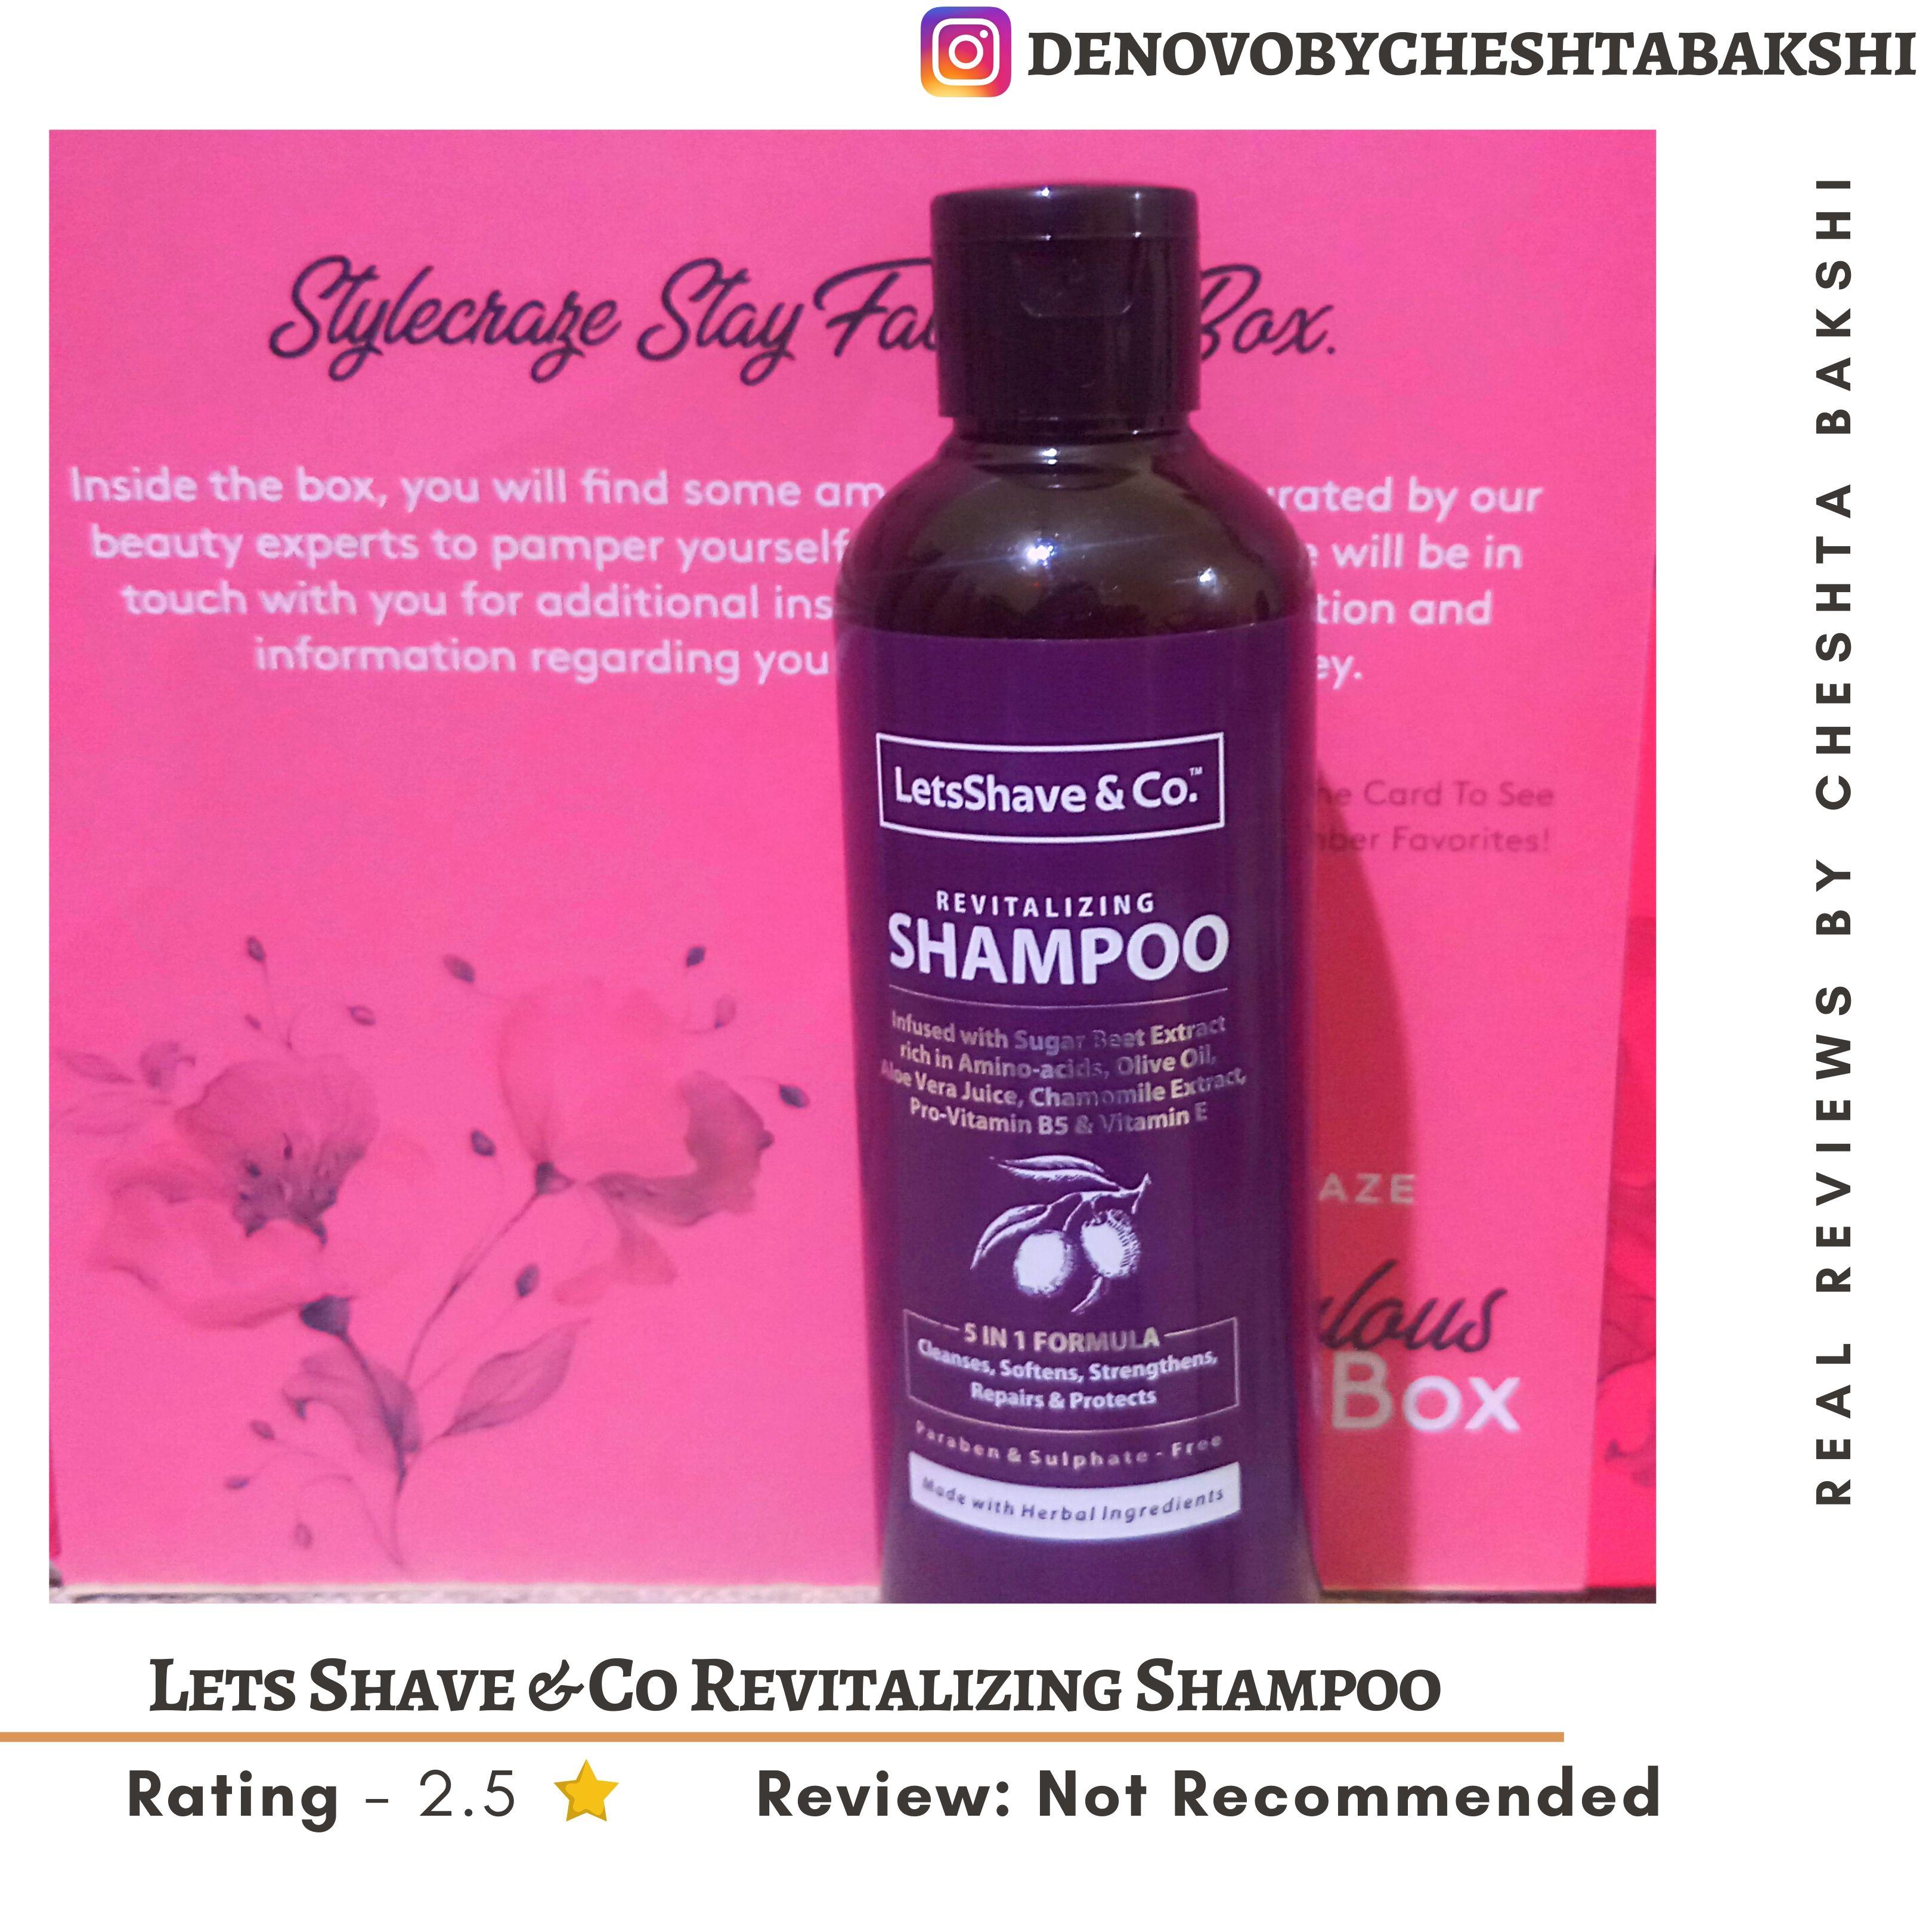 LetsShave Shampoo Conditioner Pack-An Average Product-By cheshta_bakshi